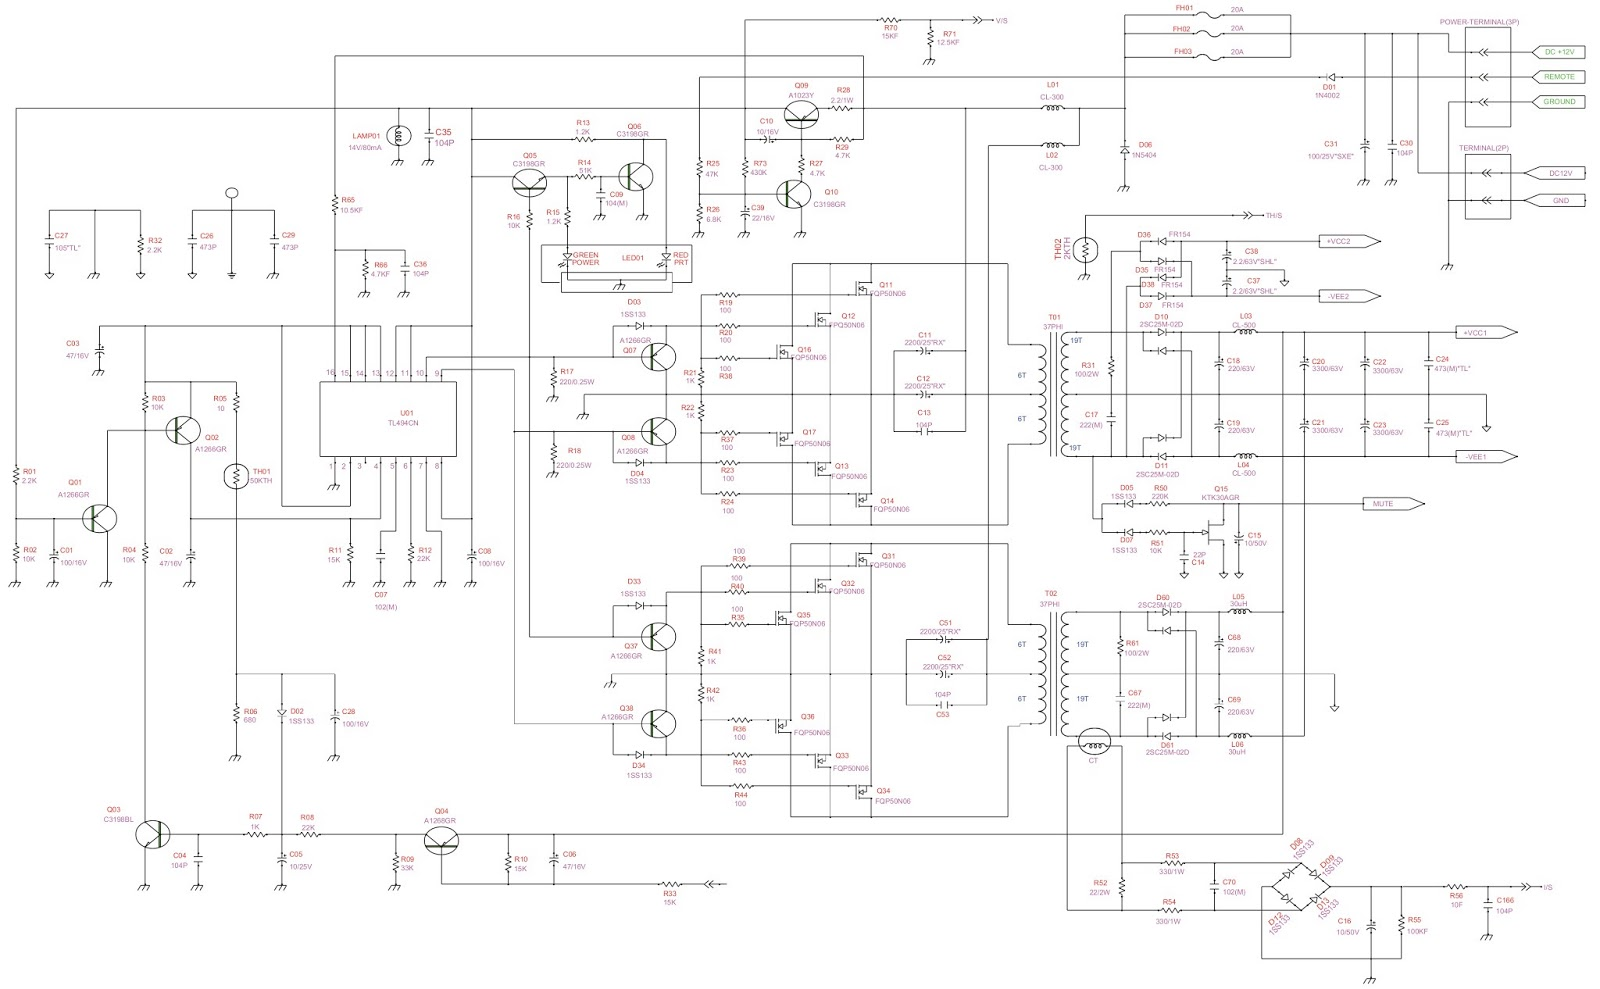 hight resolution of manualguide alpine 2 channel amp wire diagram rh whizenterprise co uk